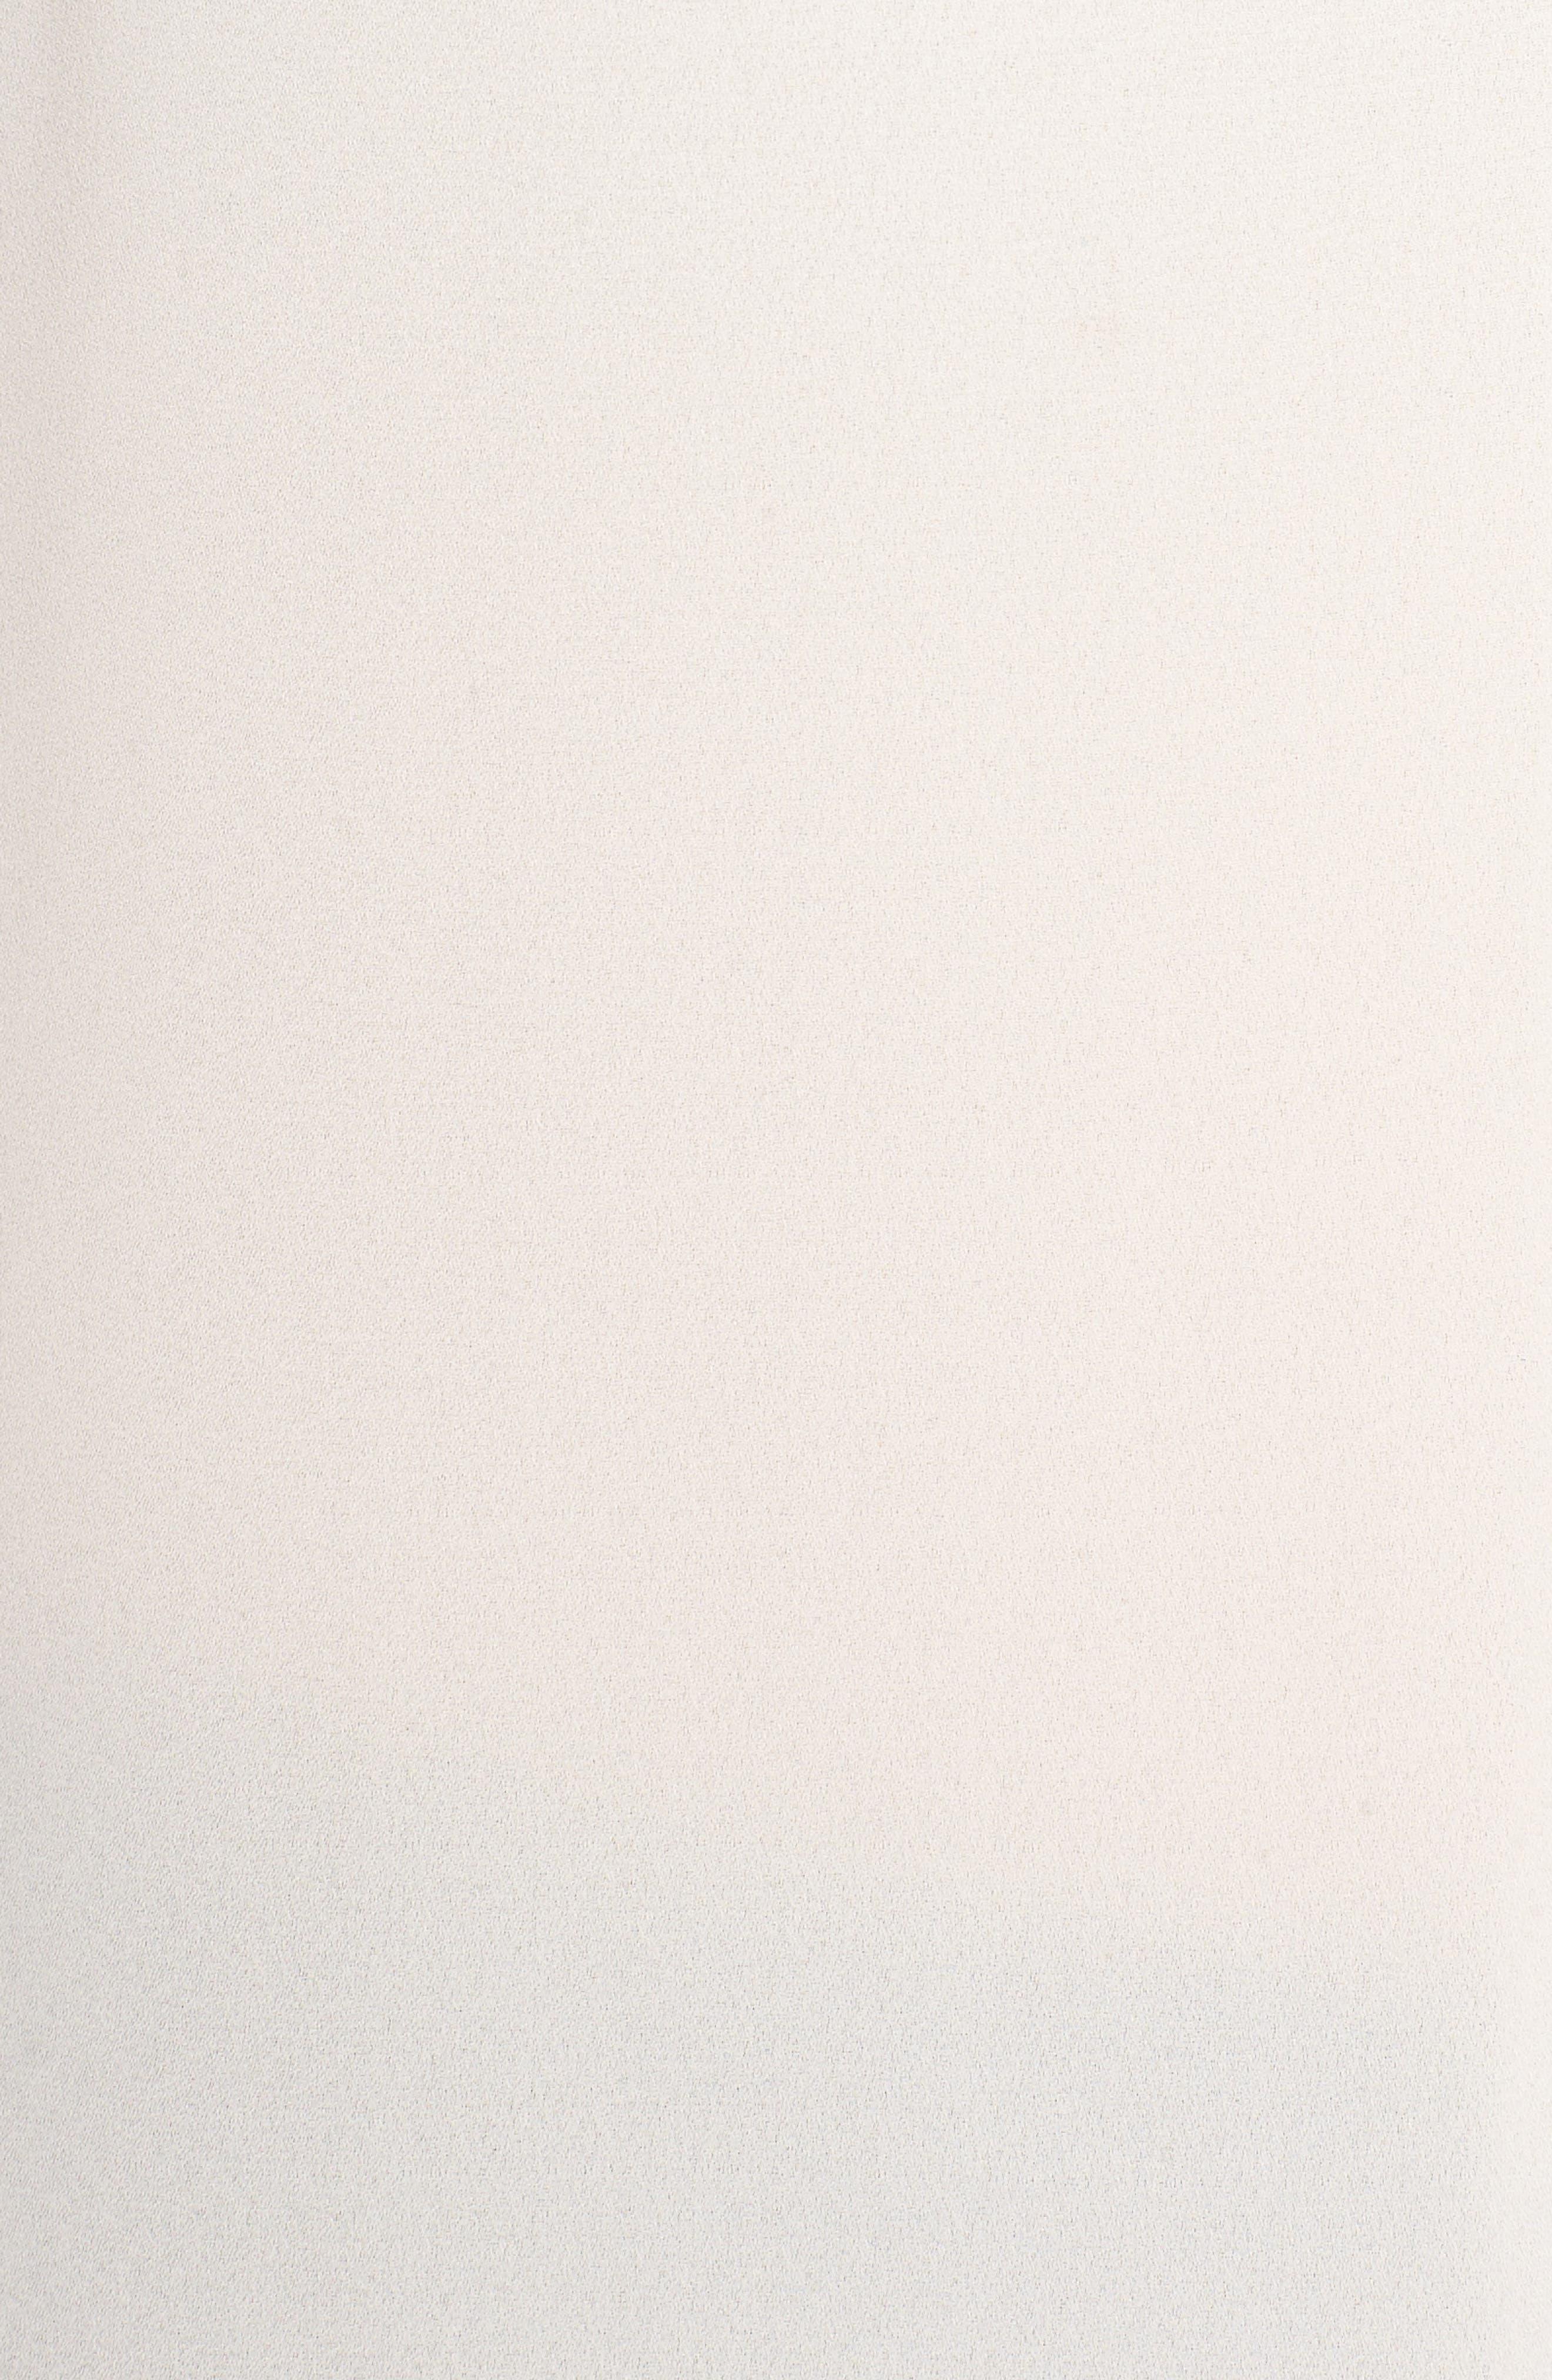 'Edie' Pleat V-Neck Blouse,                             Alternate thumbnail 5, color,                             685